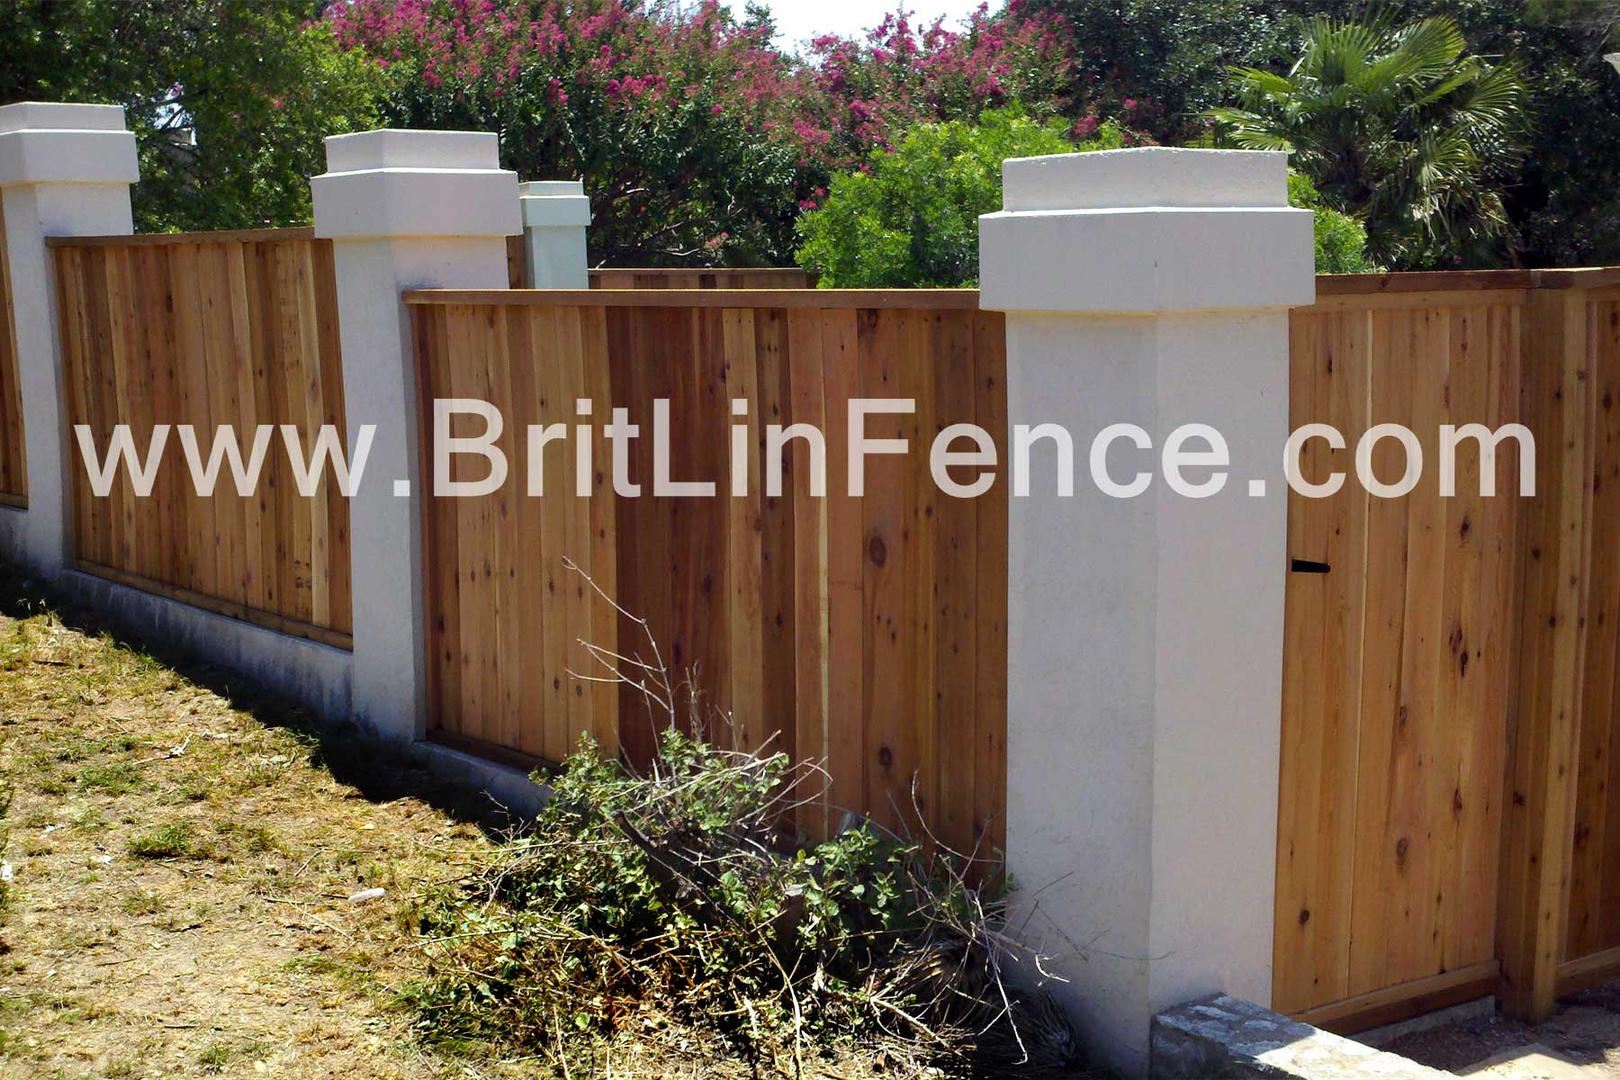 BritLin Fence image 0